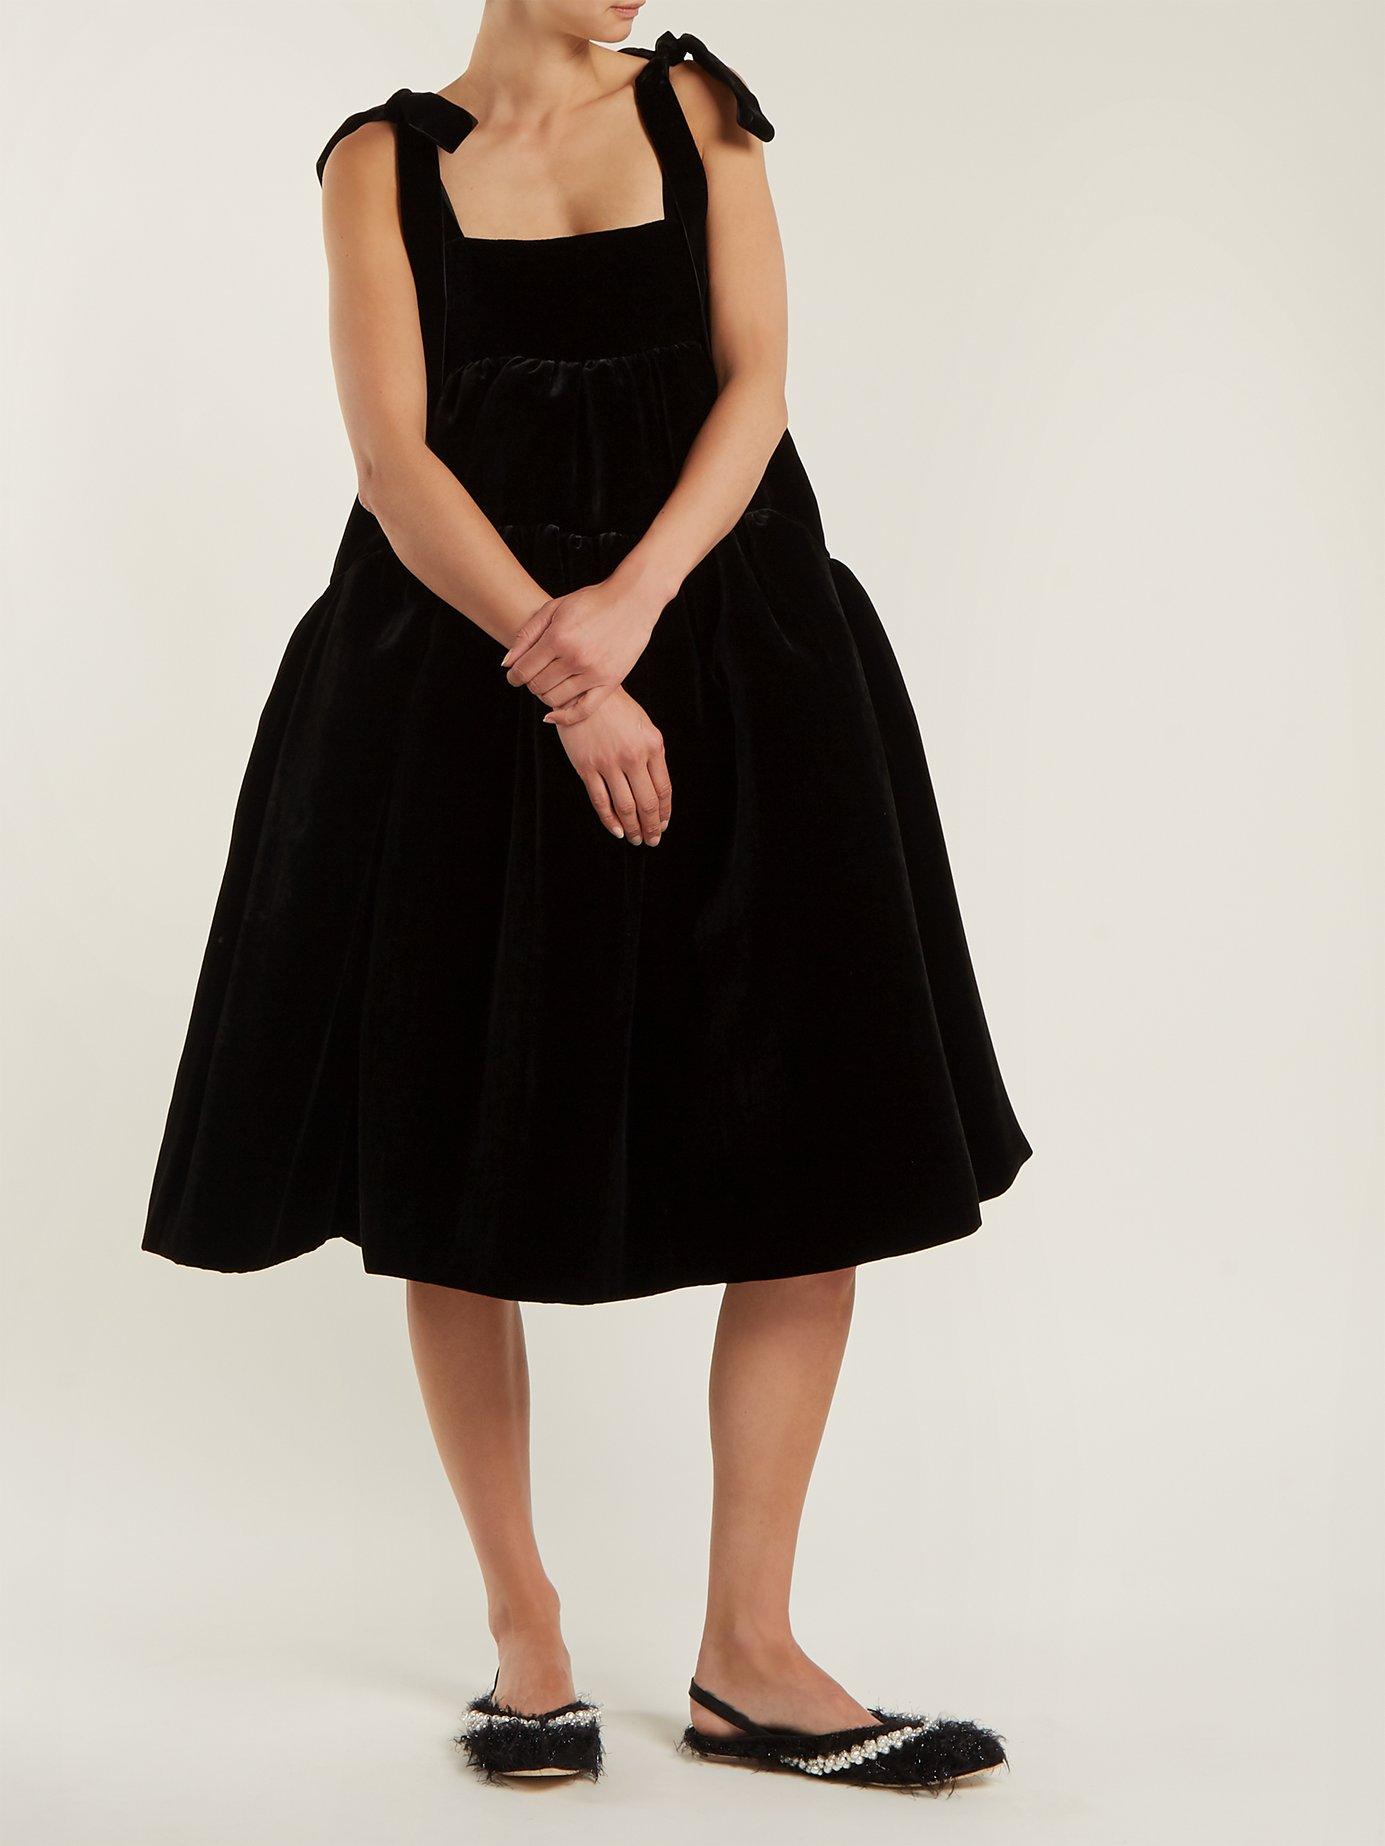 Bey velvet dress by Cecilie Bahnsen